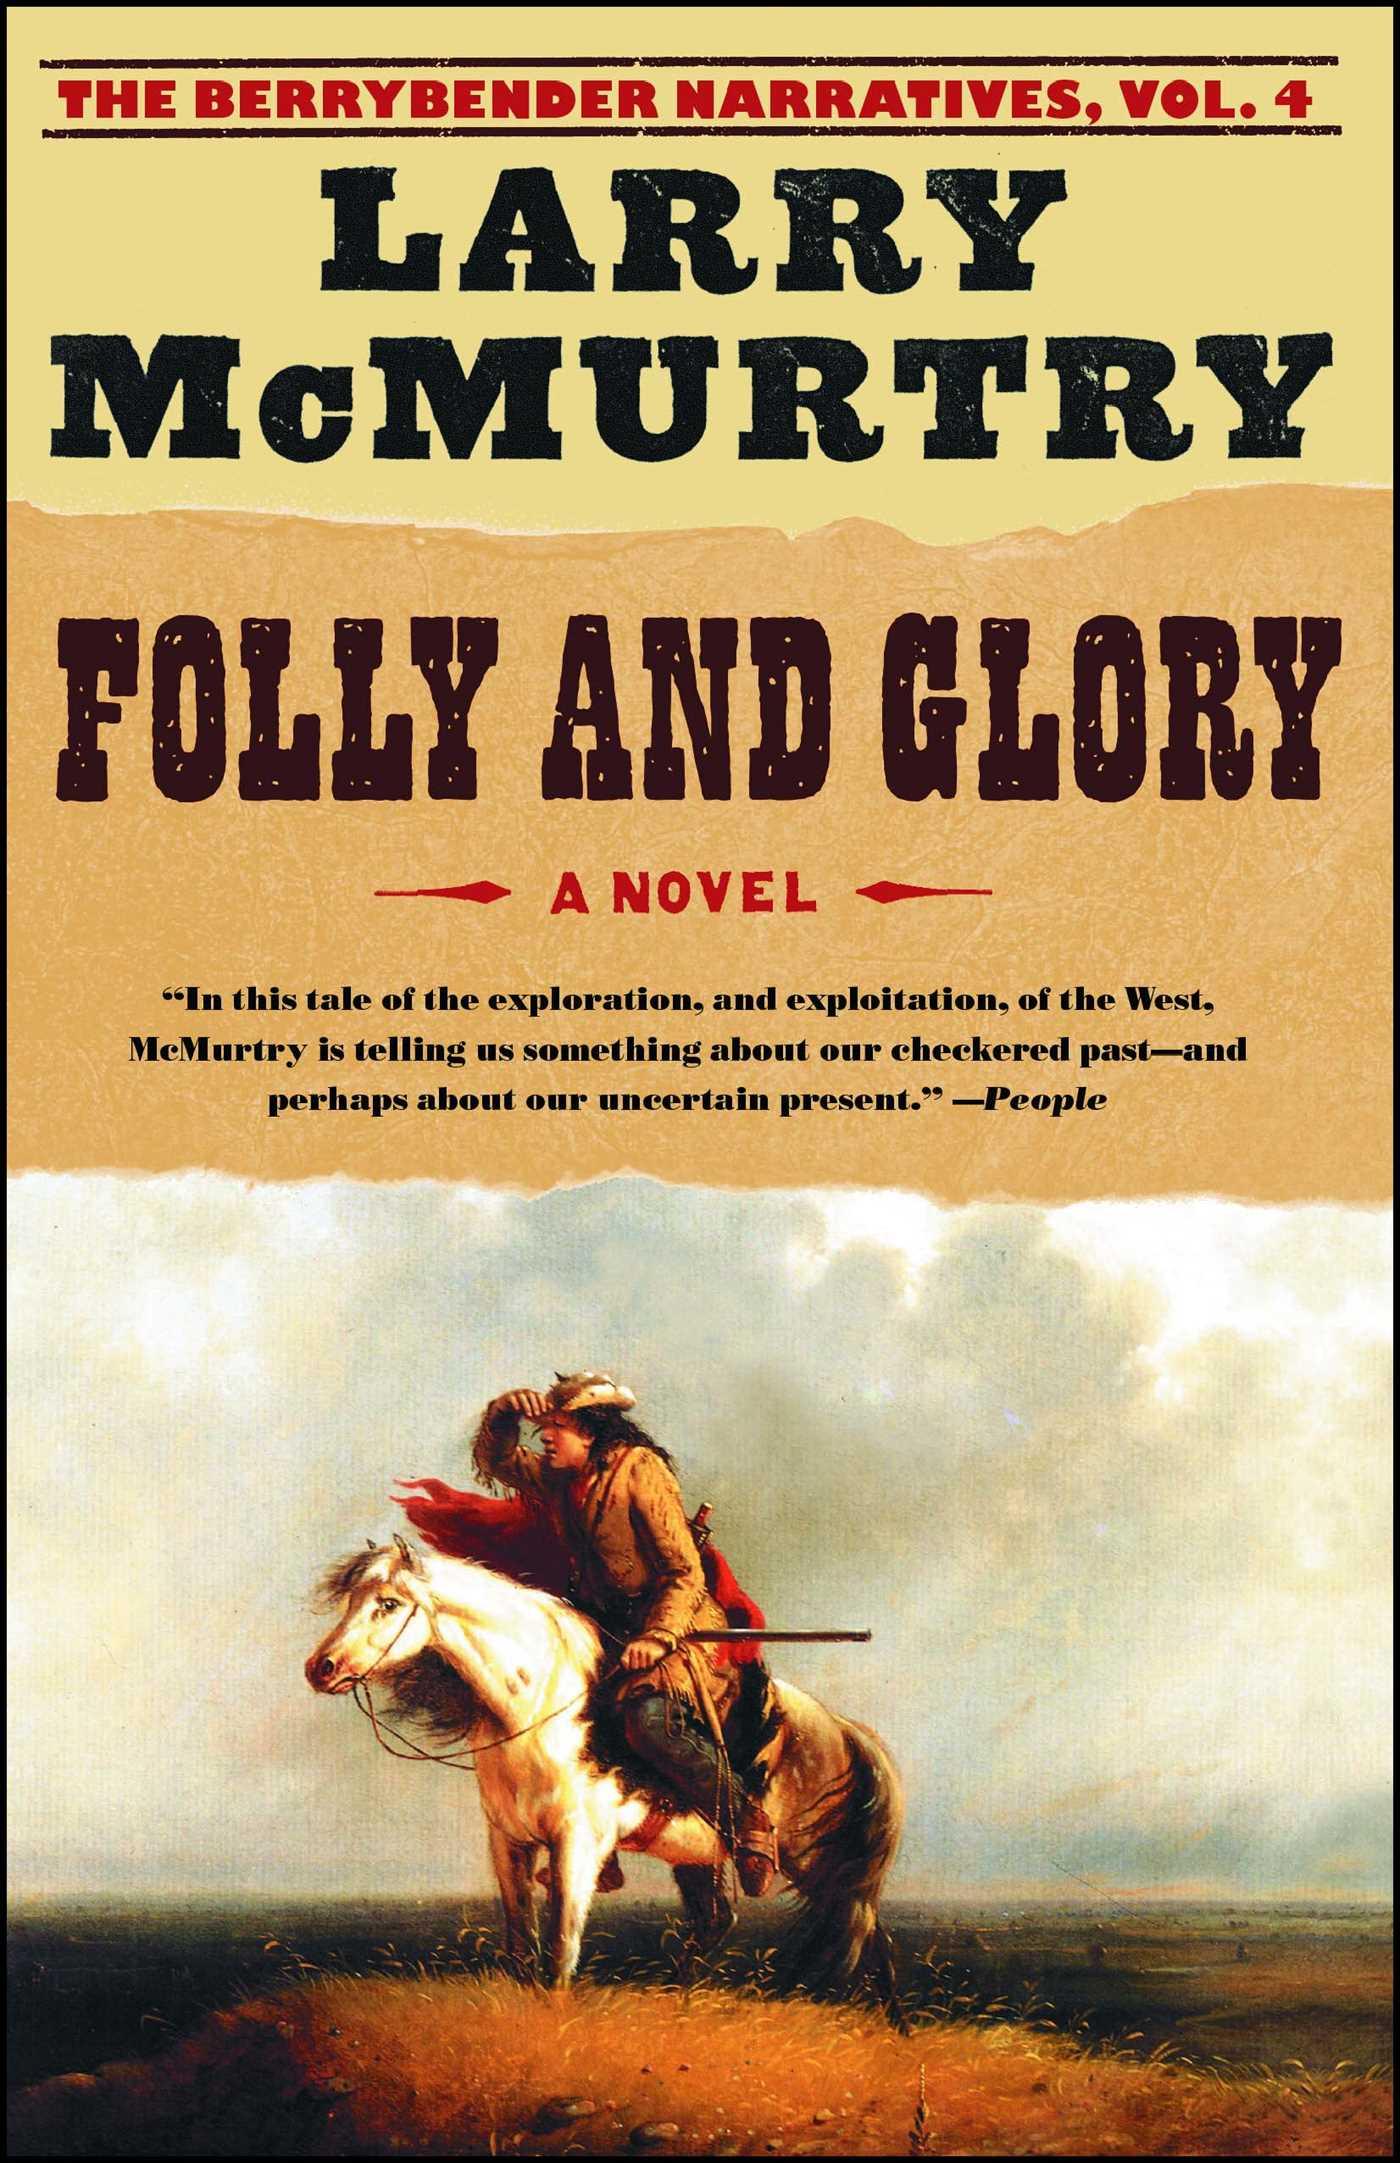 Folly and glory 9780743262729 hr